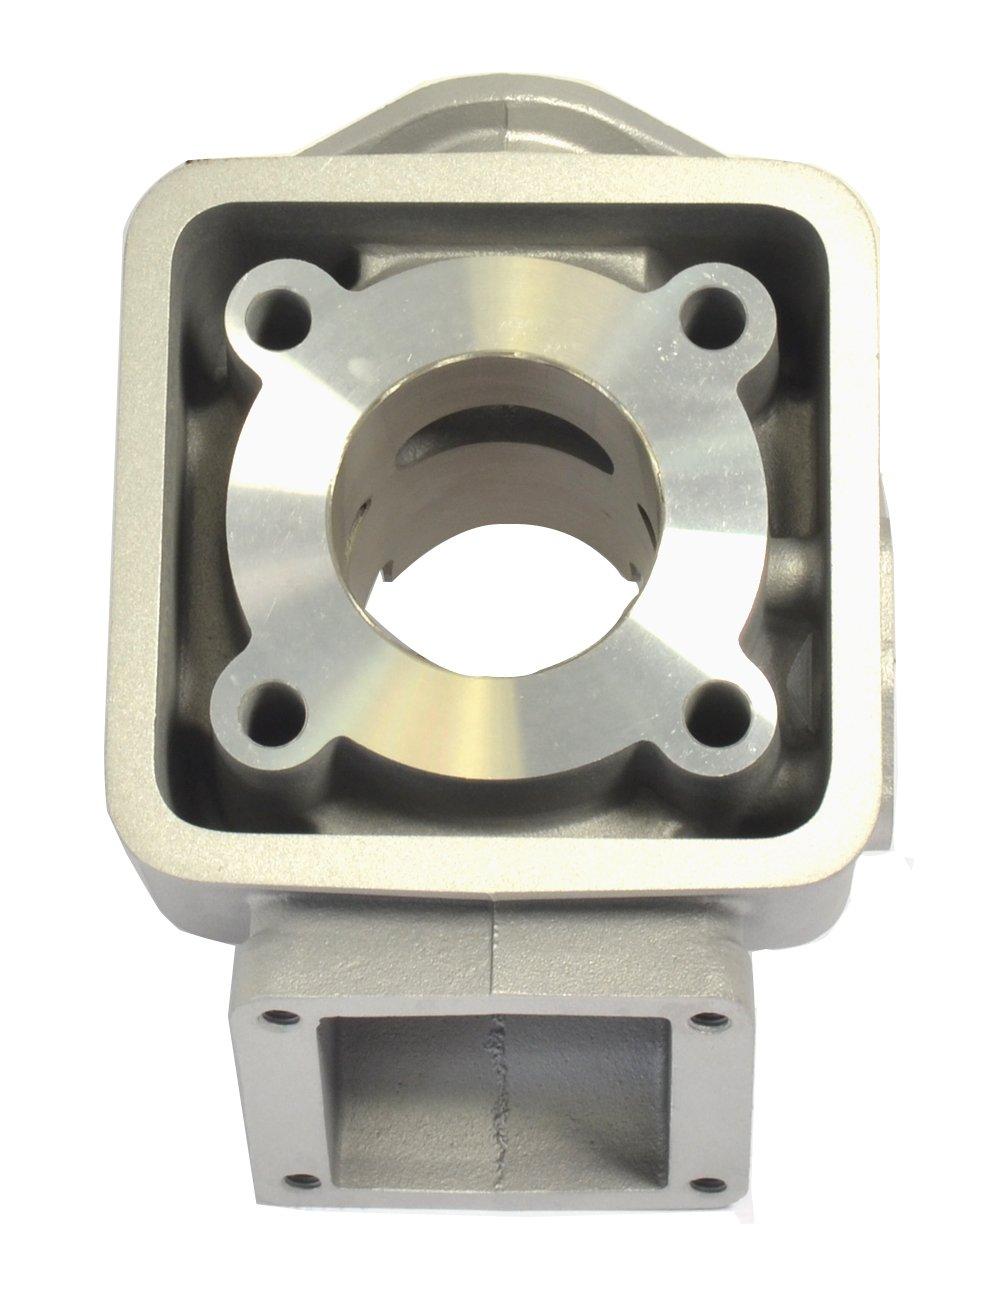 Athena (007100) 45mm Diameter Aluminum 70cc Sport Cylinder Kit by Athena